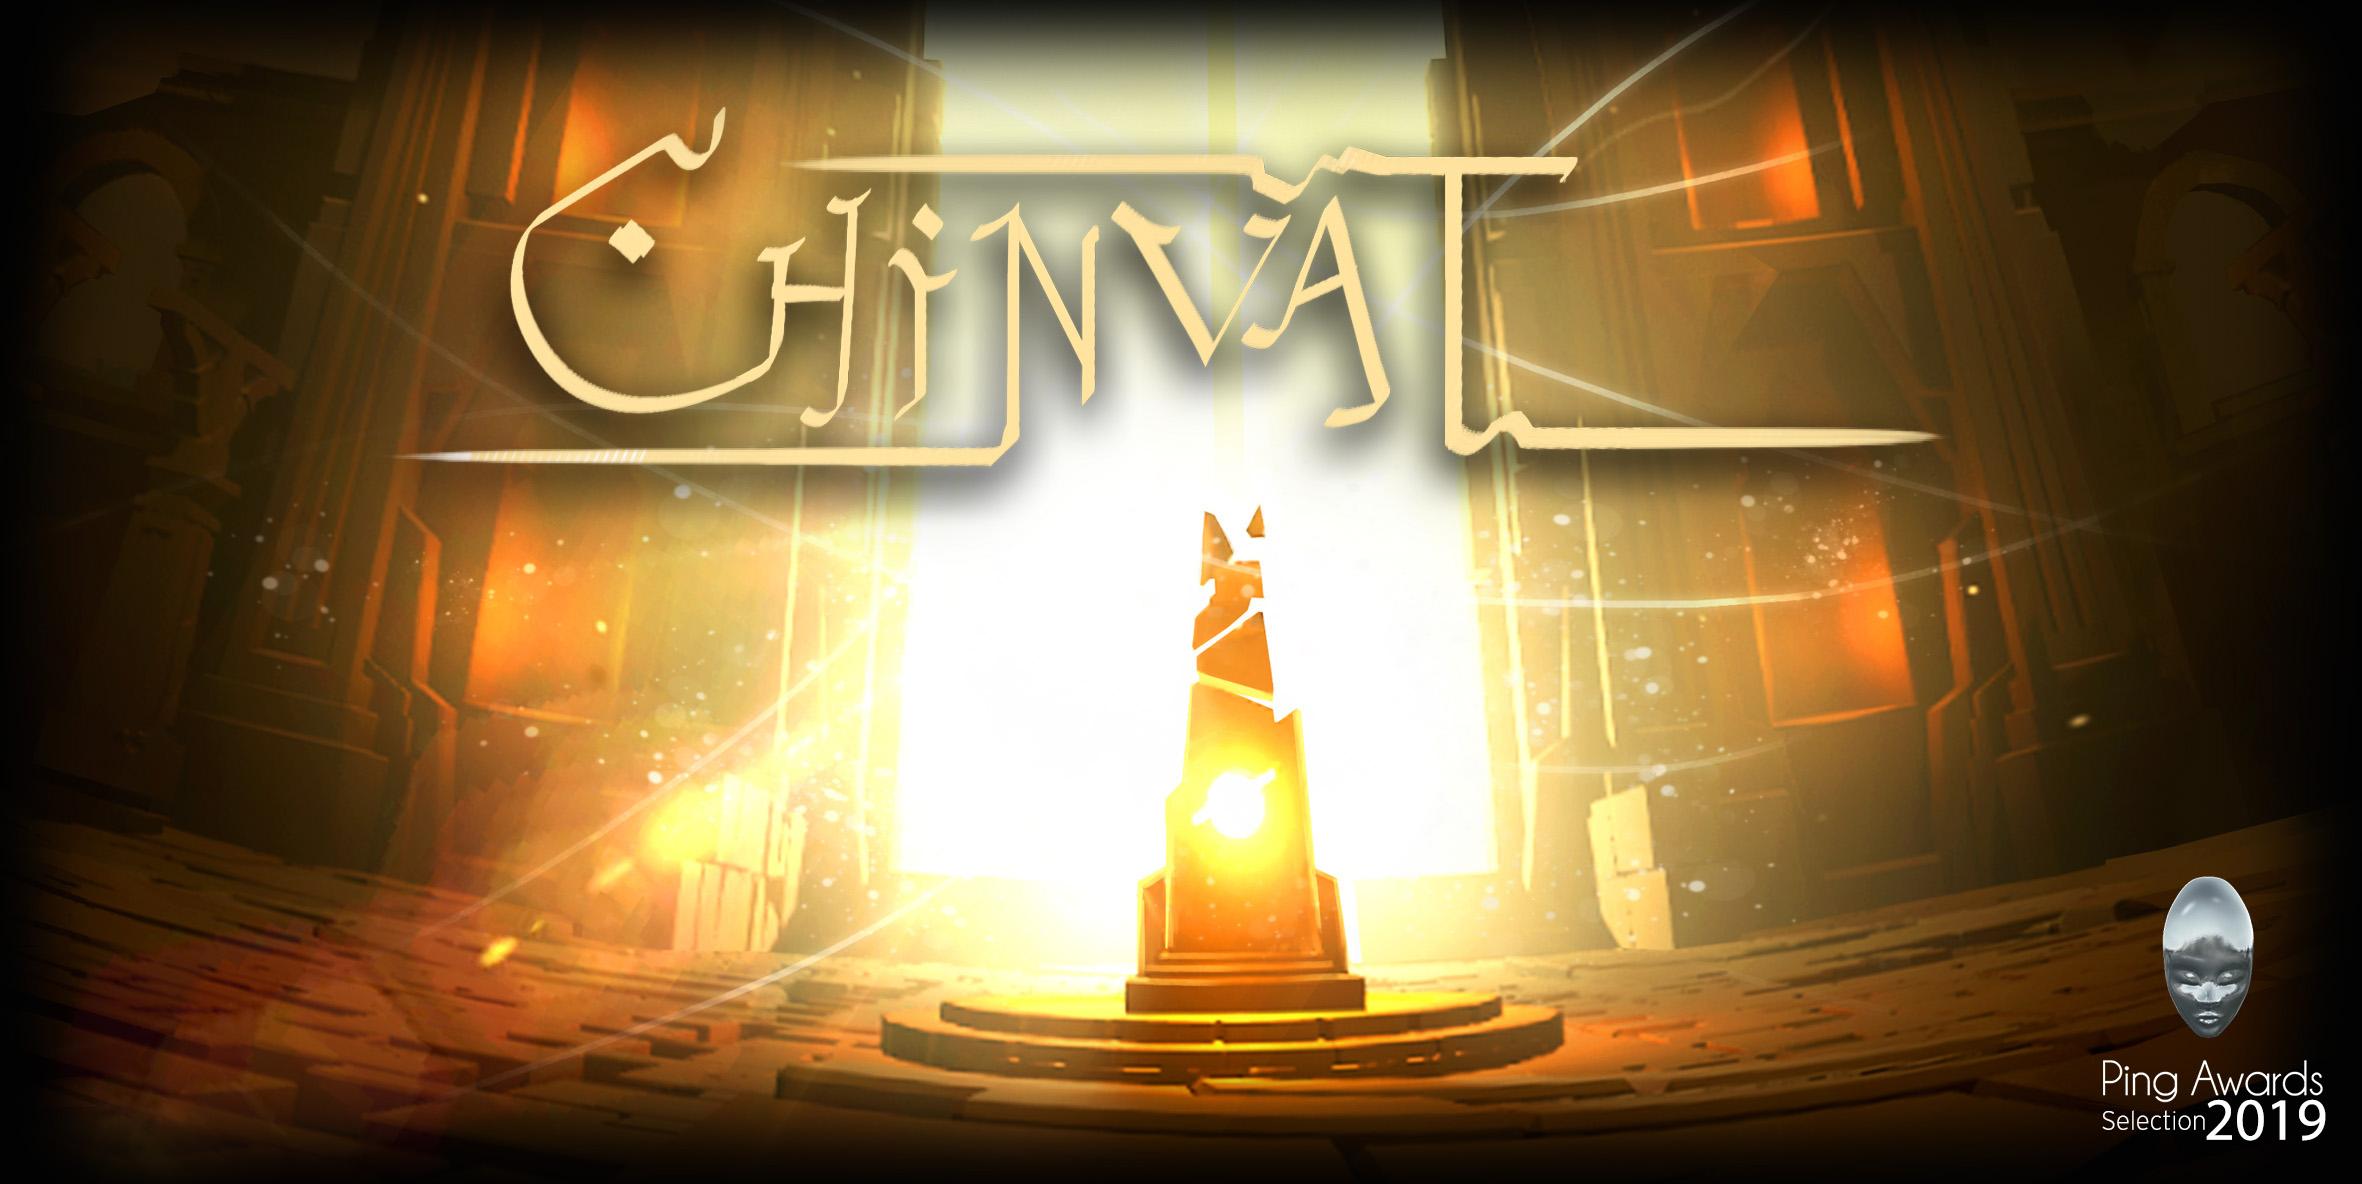 Chinvat